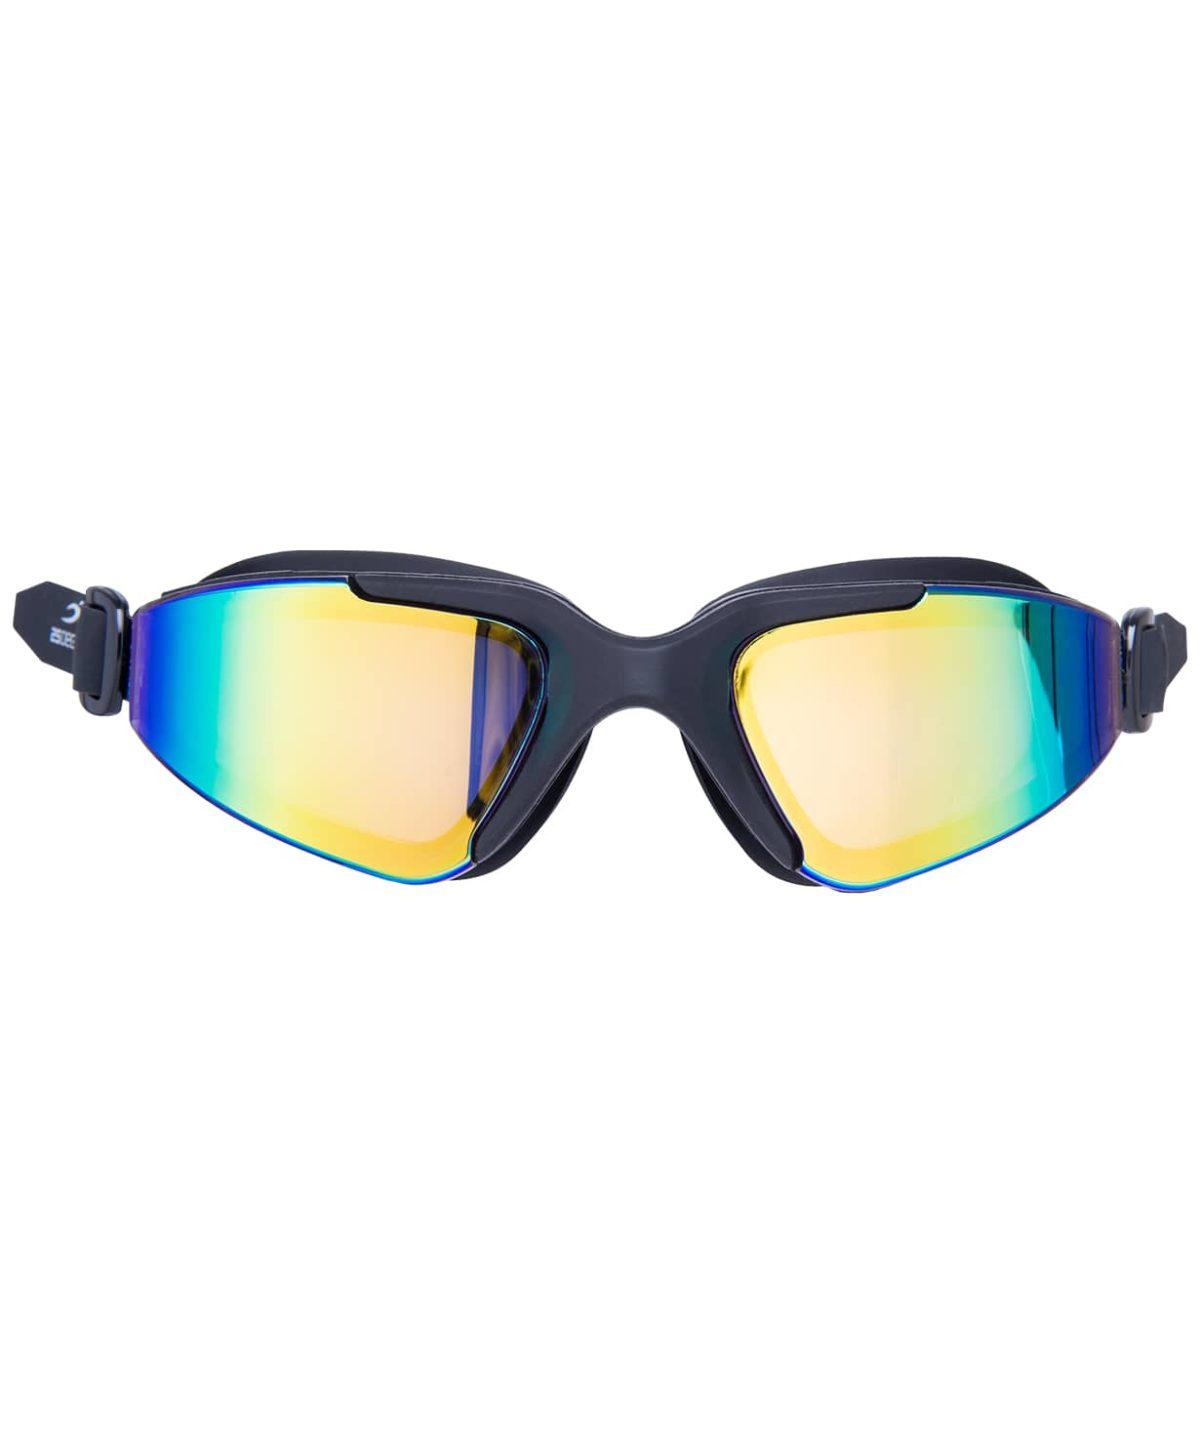 25DEGREES Prisma Mirrored Black Очки для плавания подростковые  17341 - 2